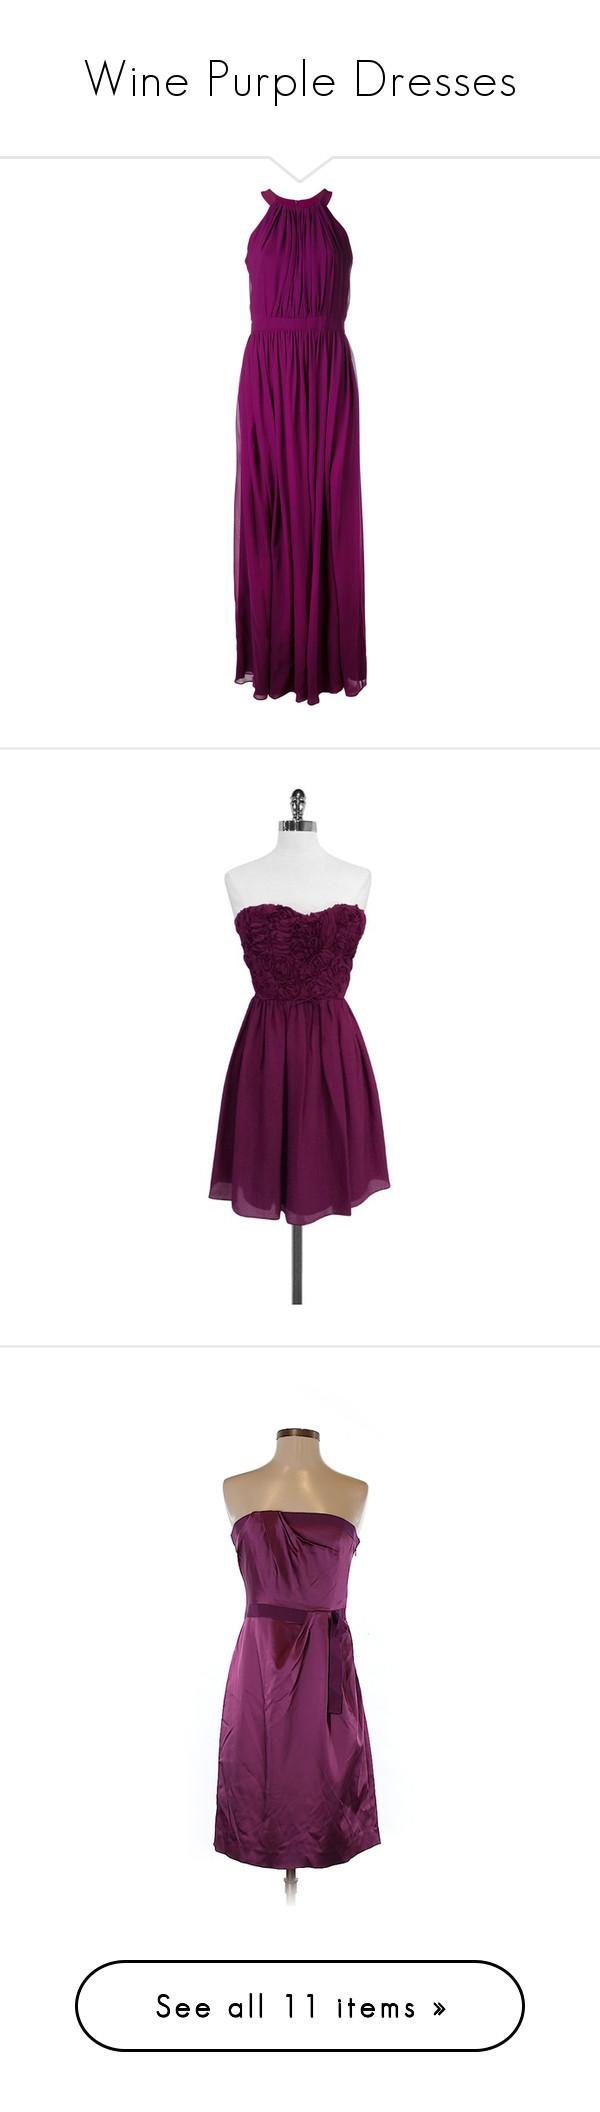 Wine purple dresses